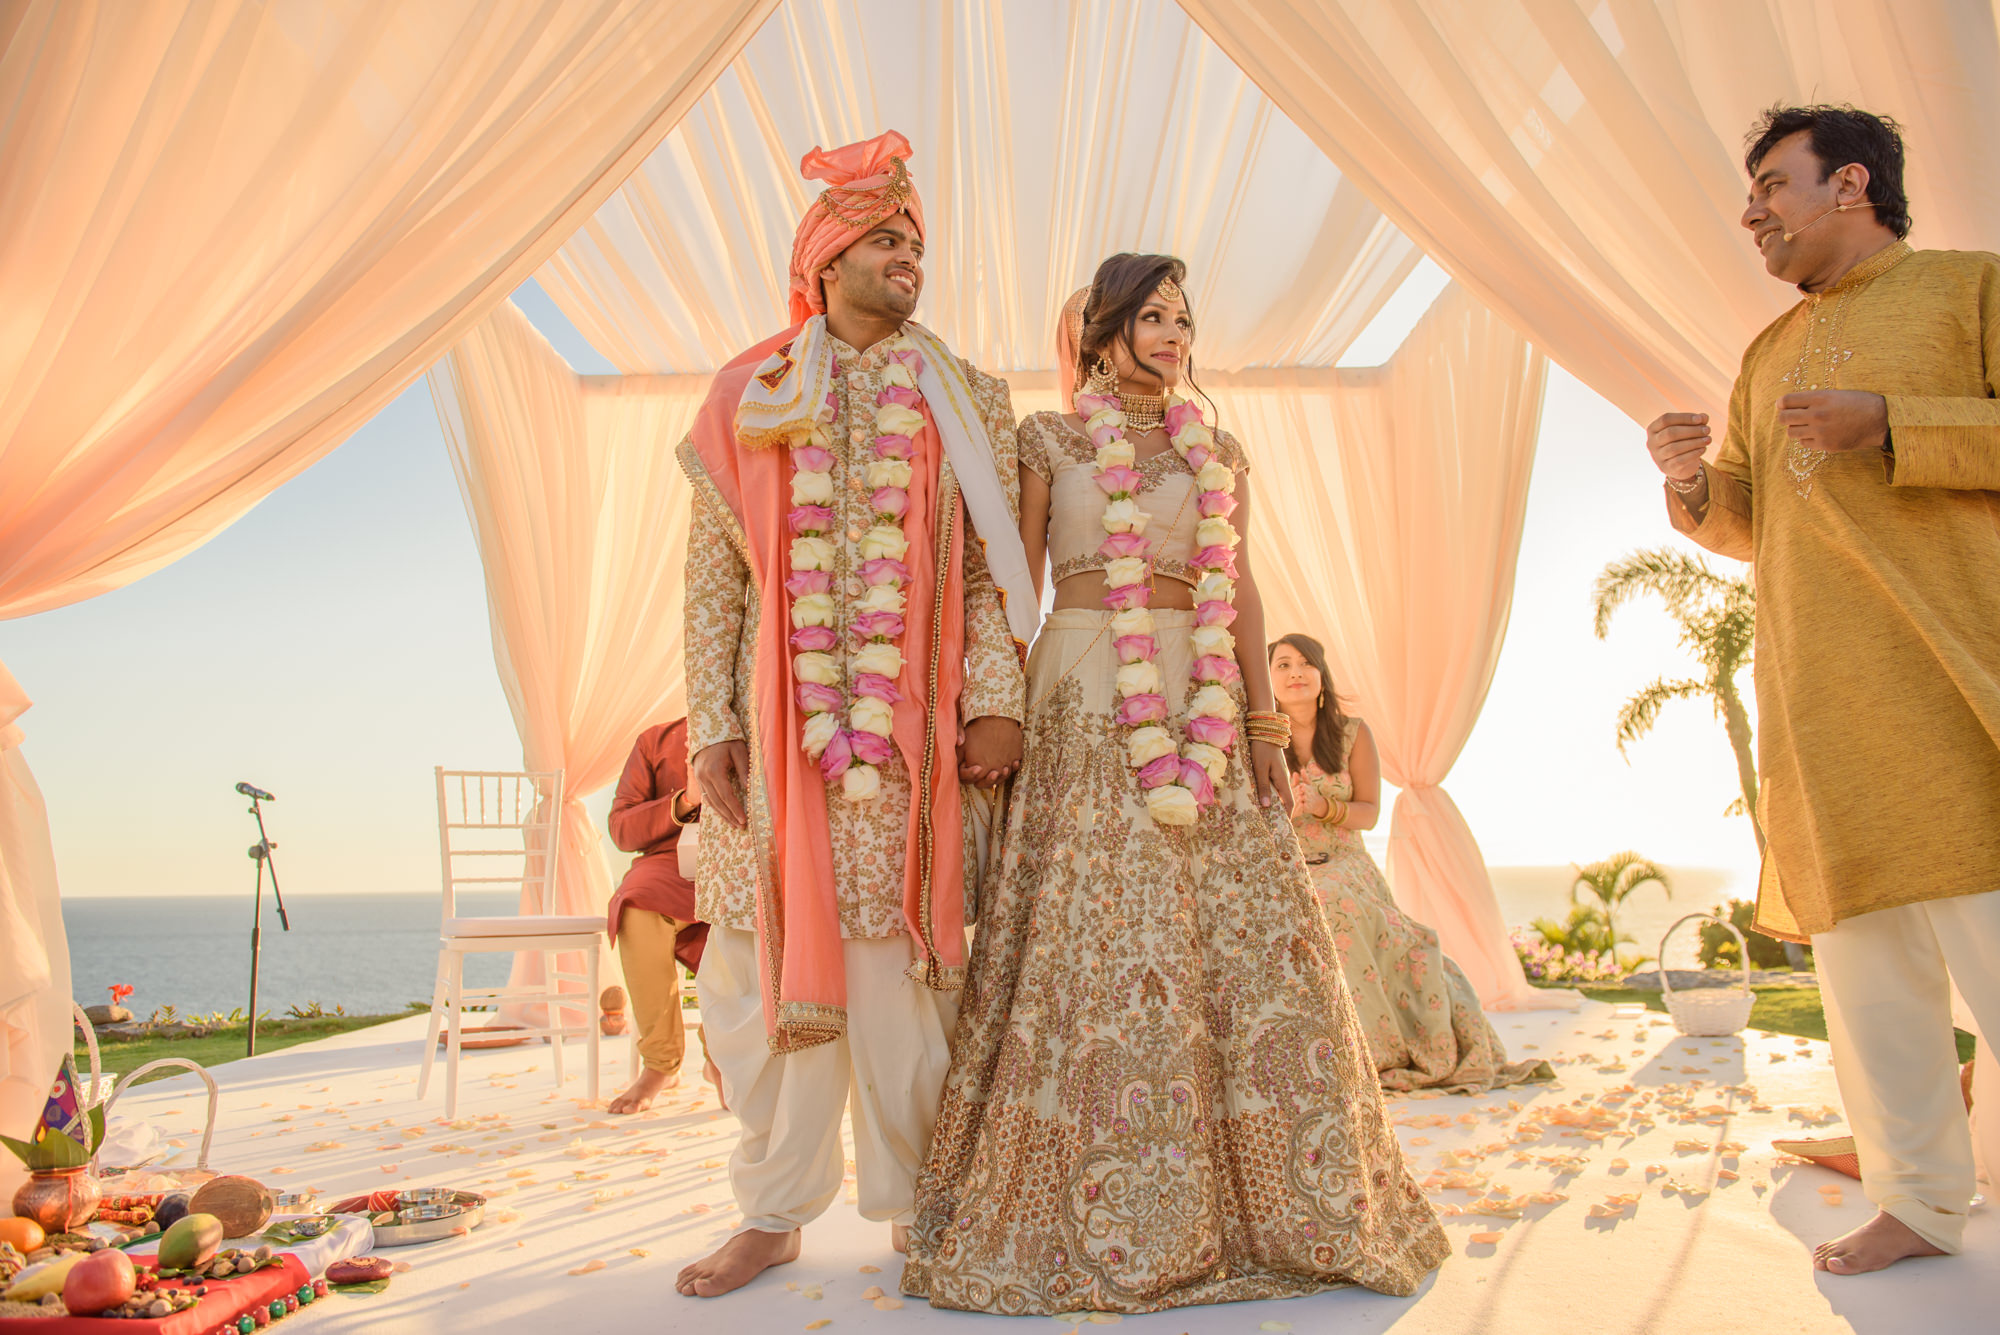 satnam photography wedding indian asian hindu destination wedding photographer tenerife ritz carlton abama-220.jpg